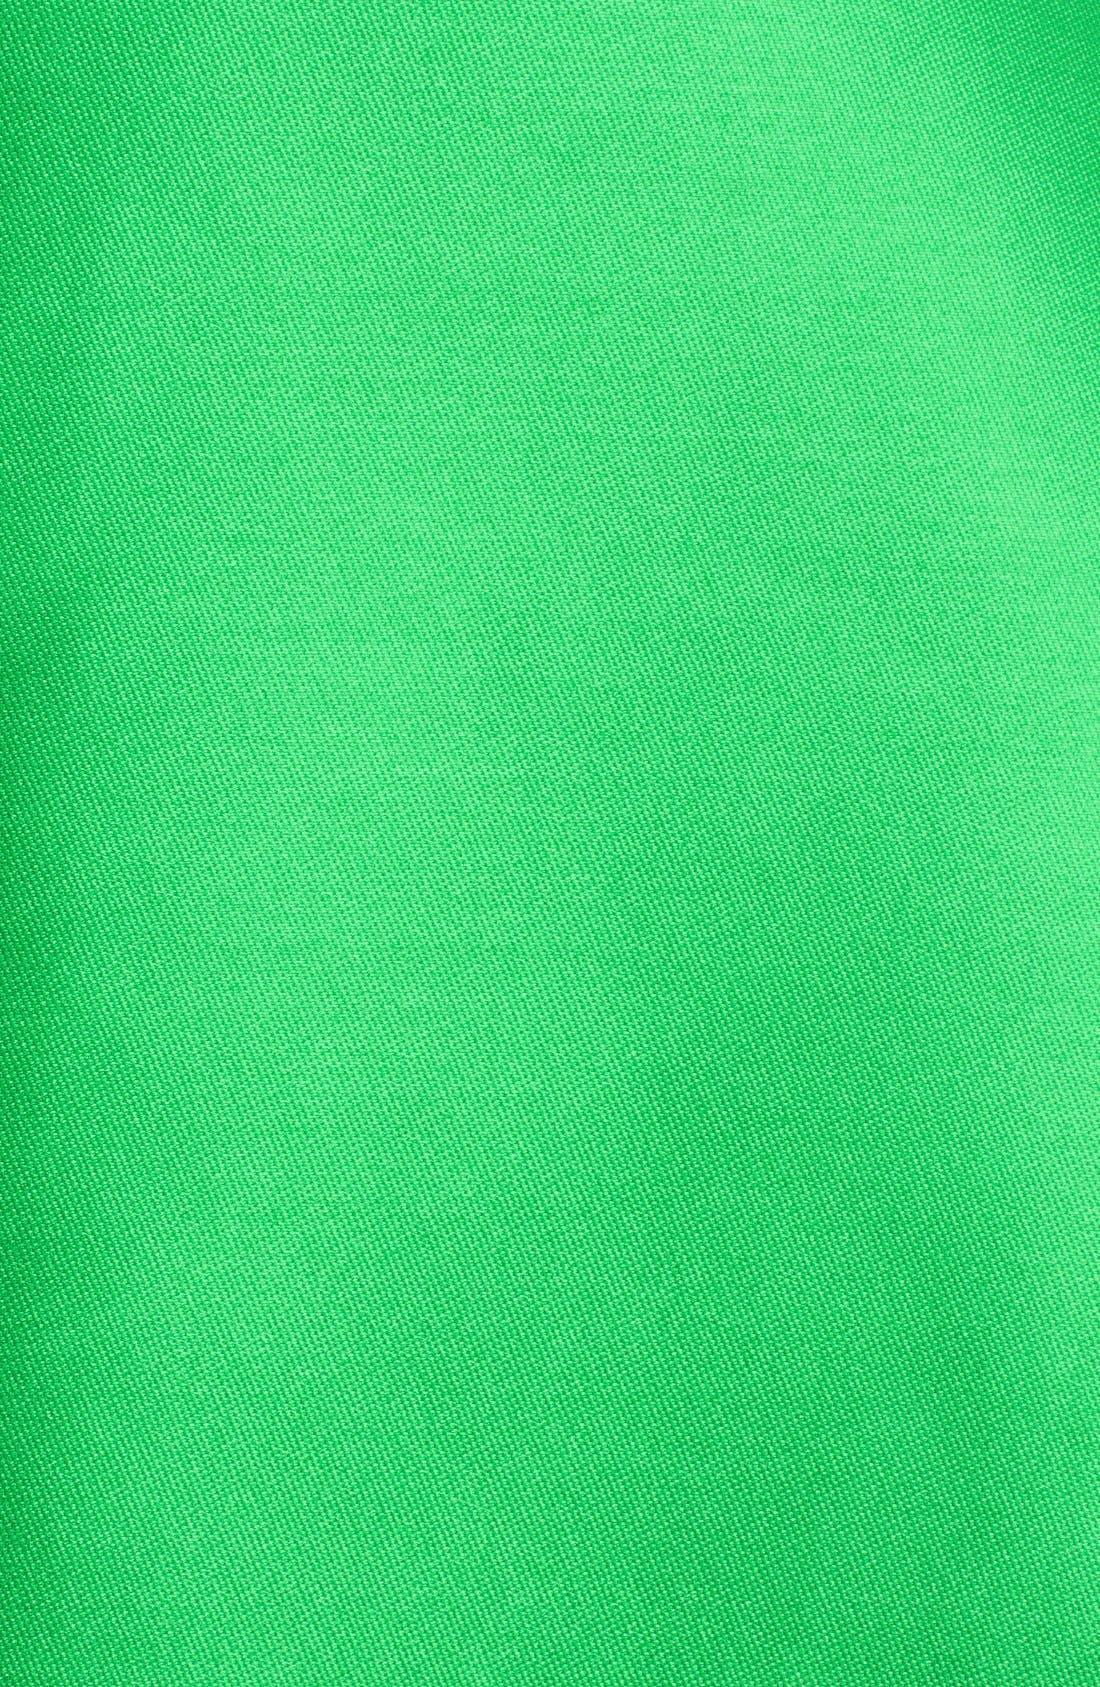 Alternate Image 3  - kate spade new york 'origami' fit & flare dress